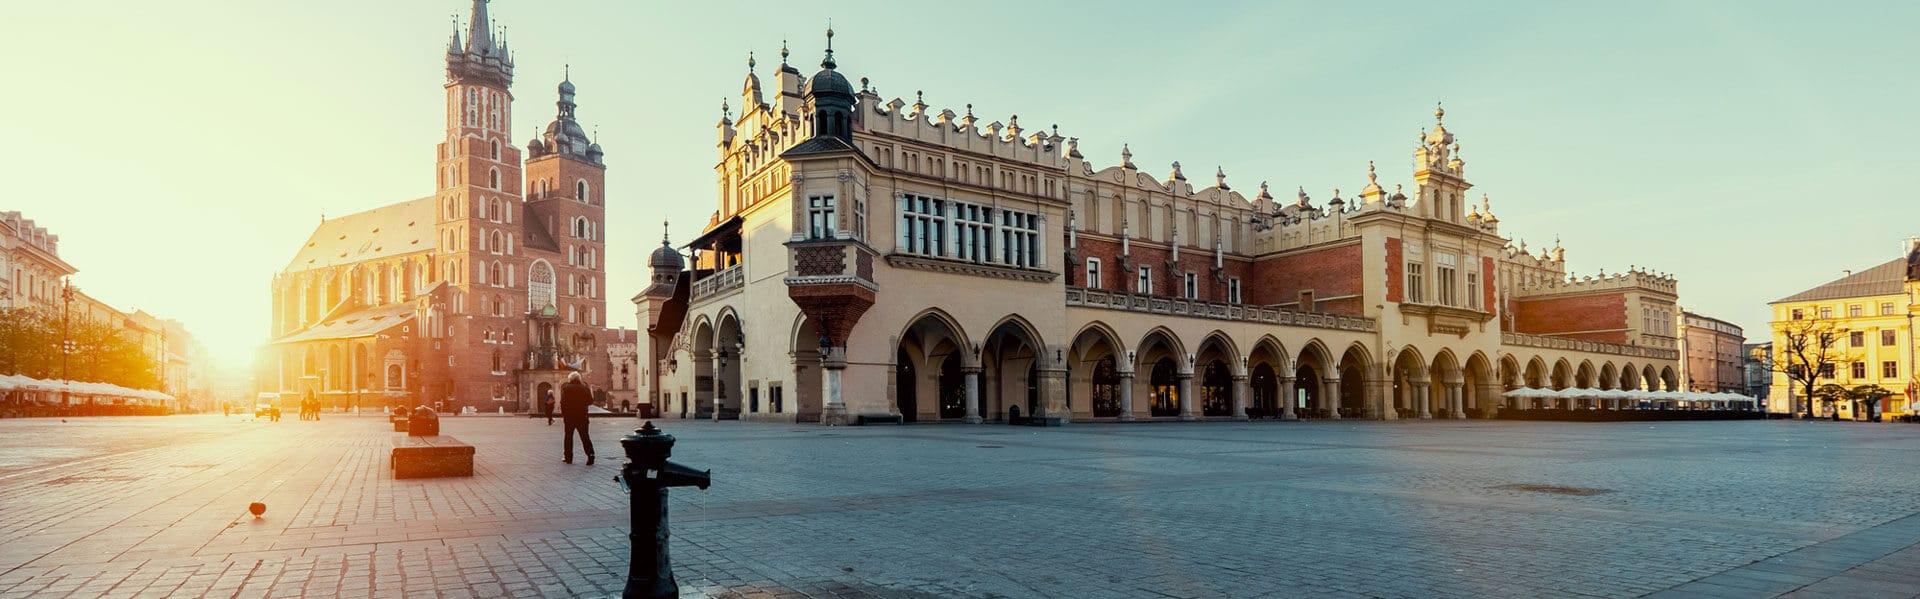 Incentive Reise nach Krakau mit b-ceed